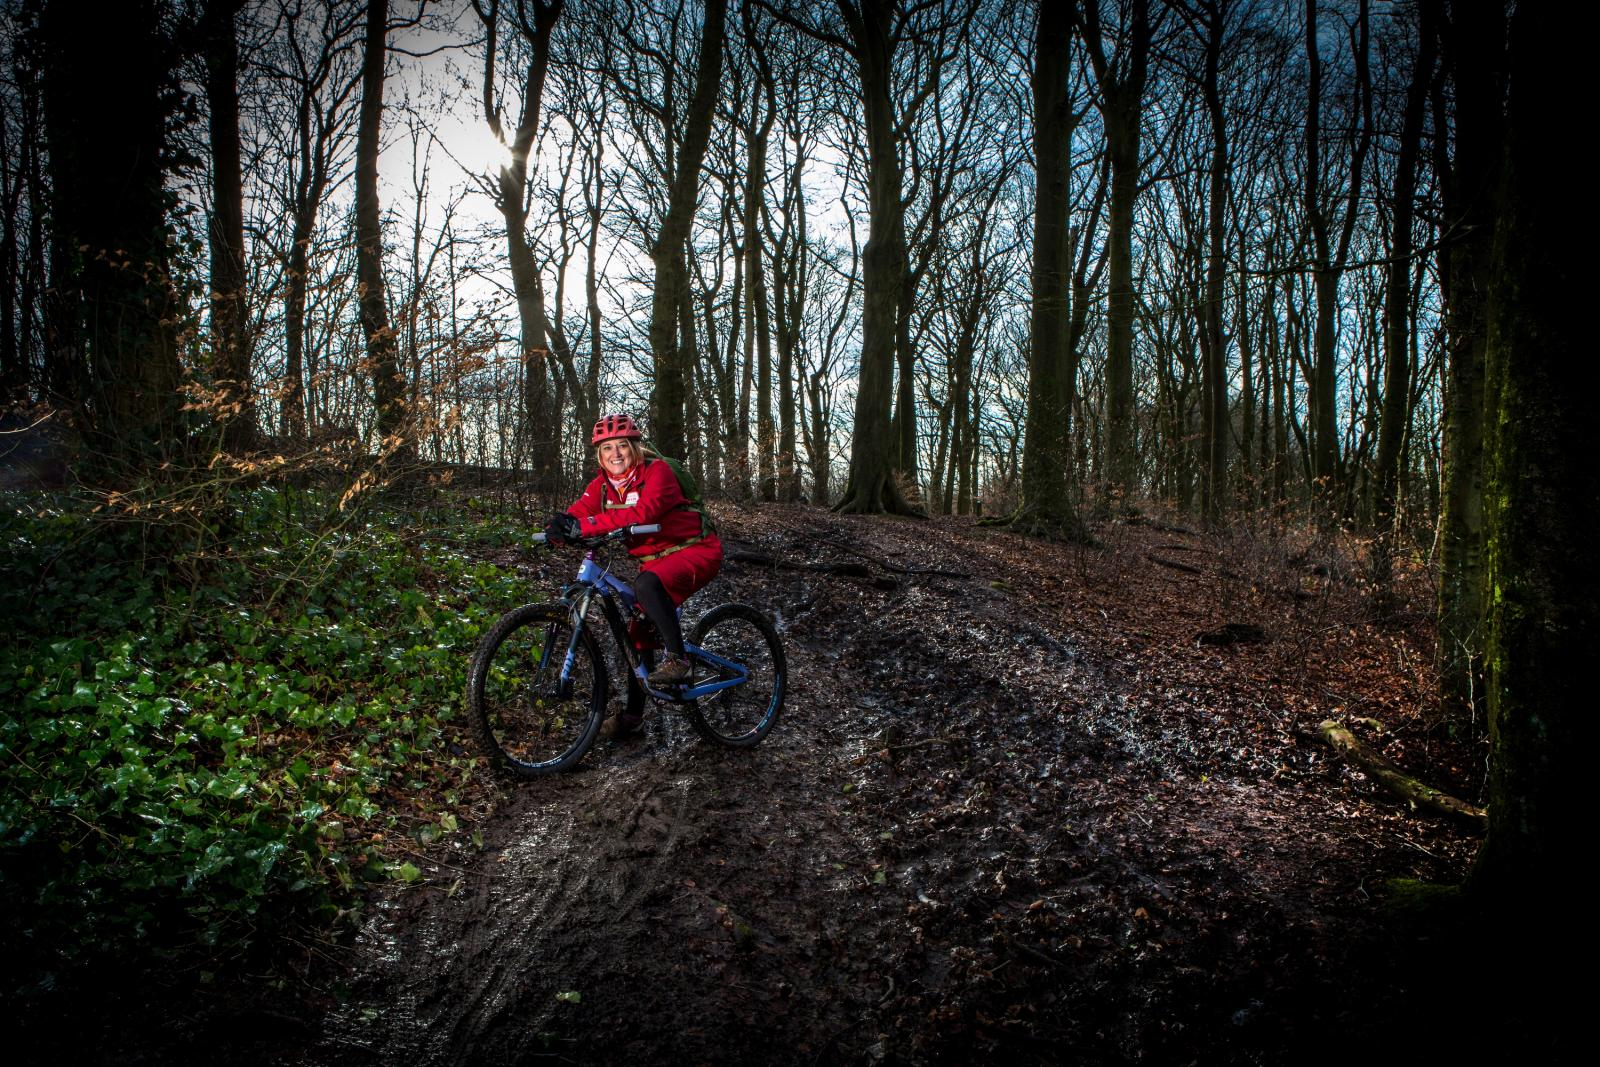 Forest Biking Landscape